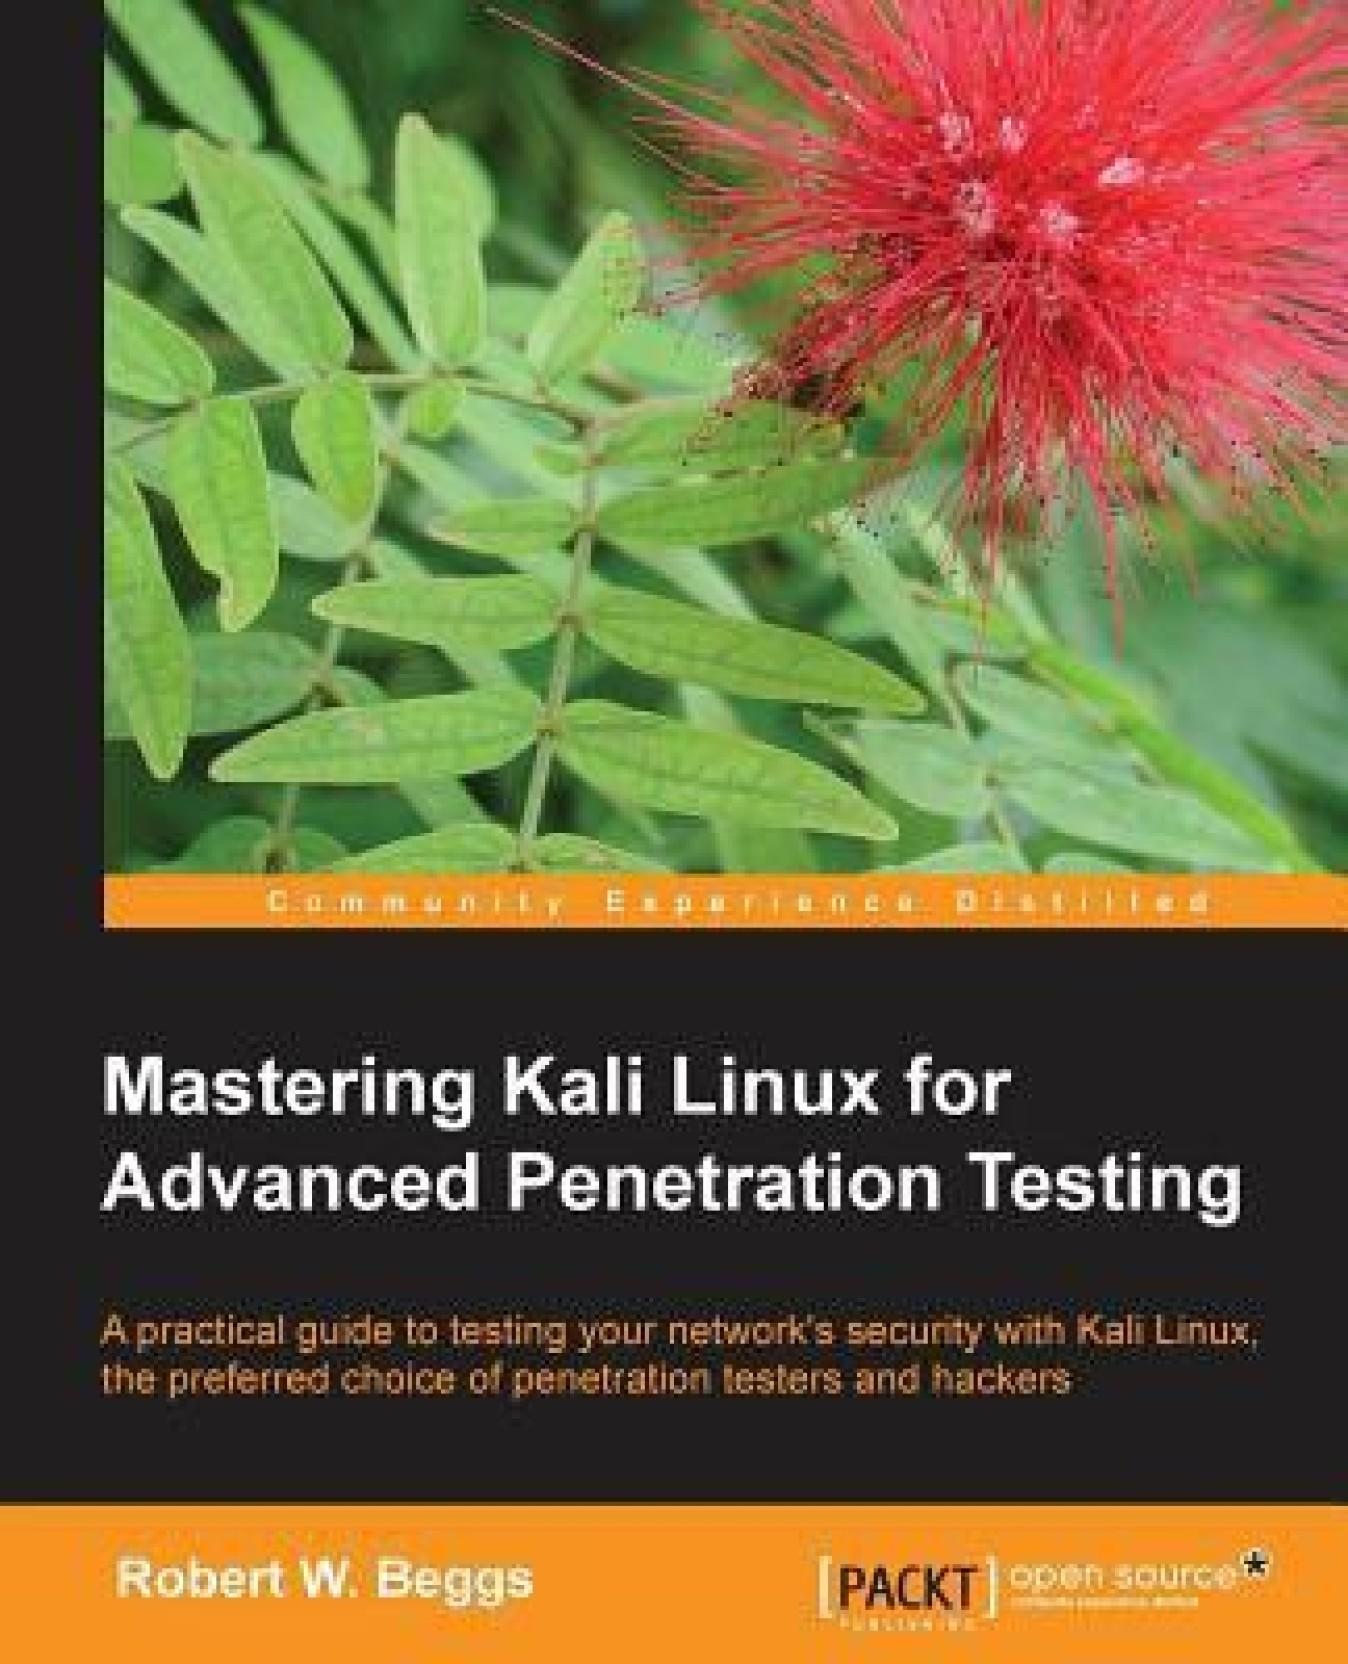 Mastering Kali Linux for Advanced Penetration Testing: Buy